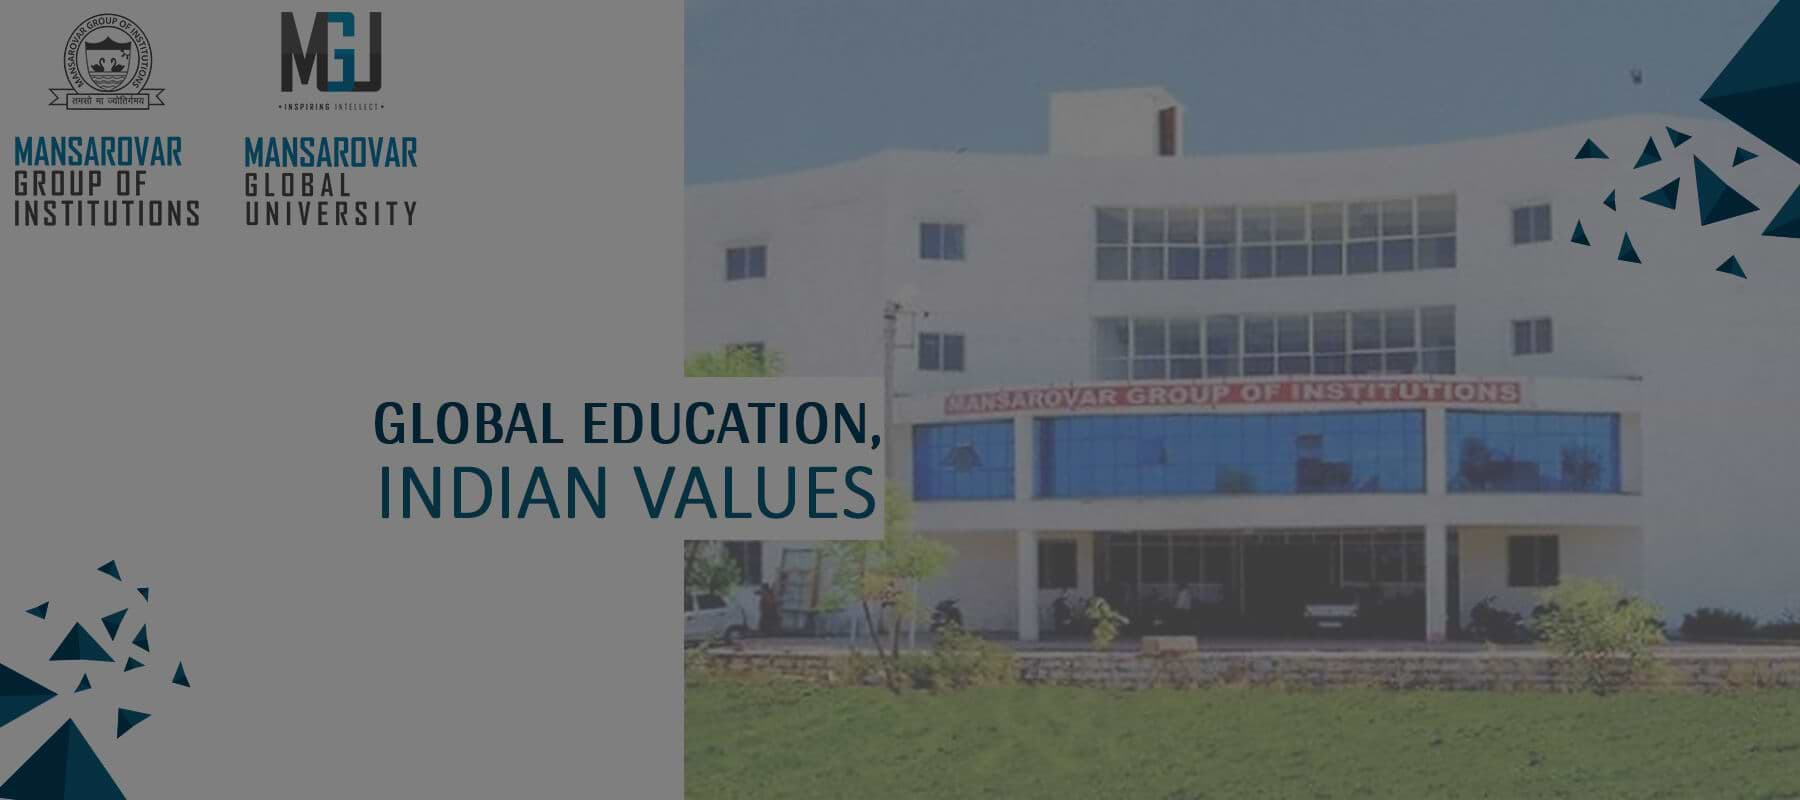 Mansarovar Global University